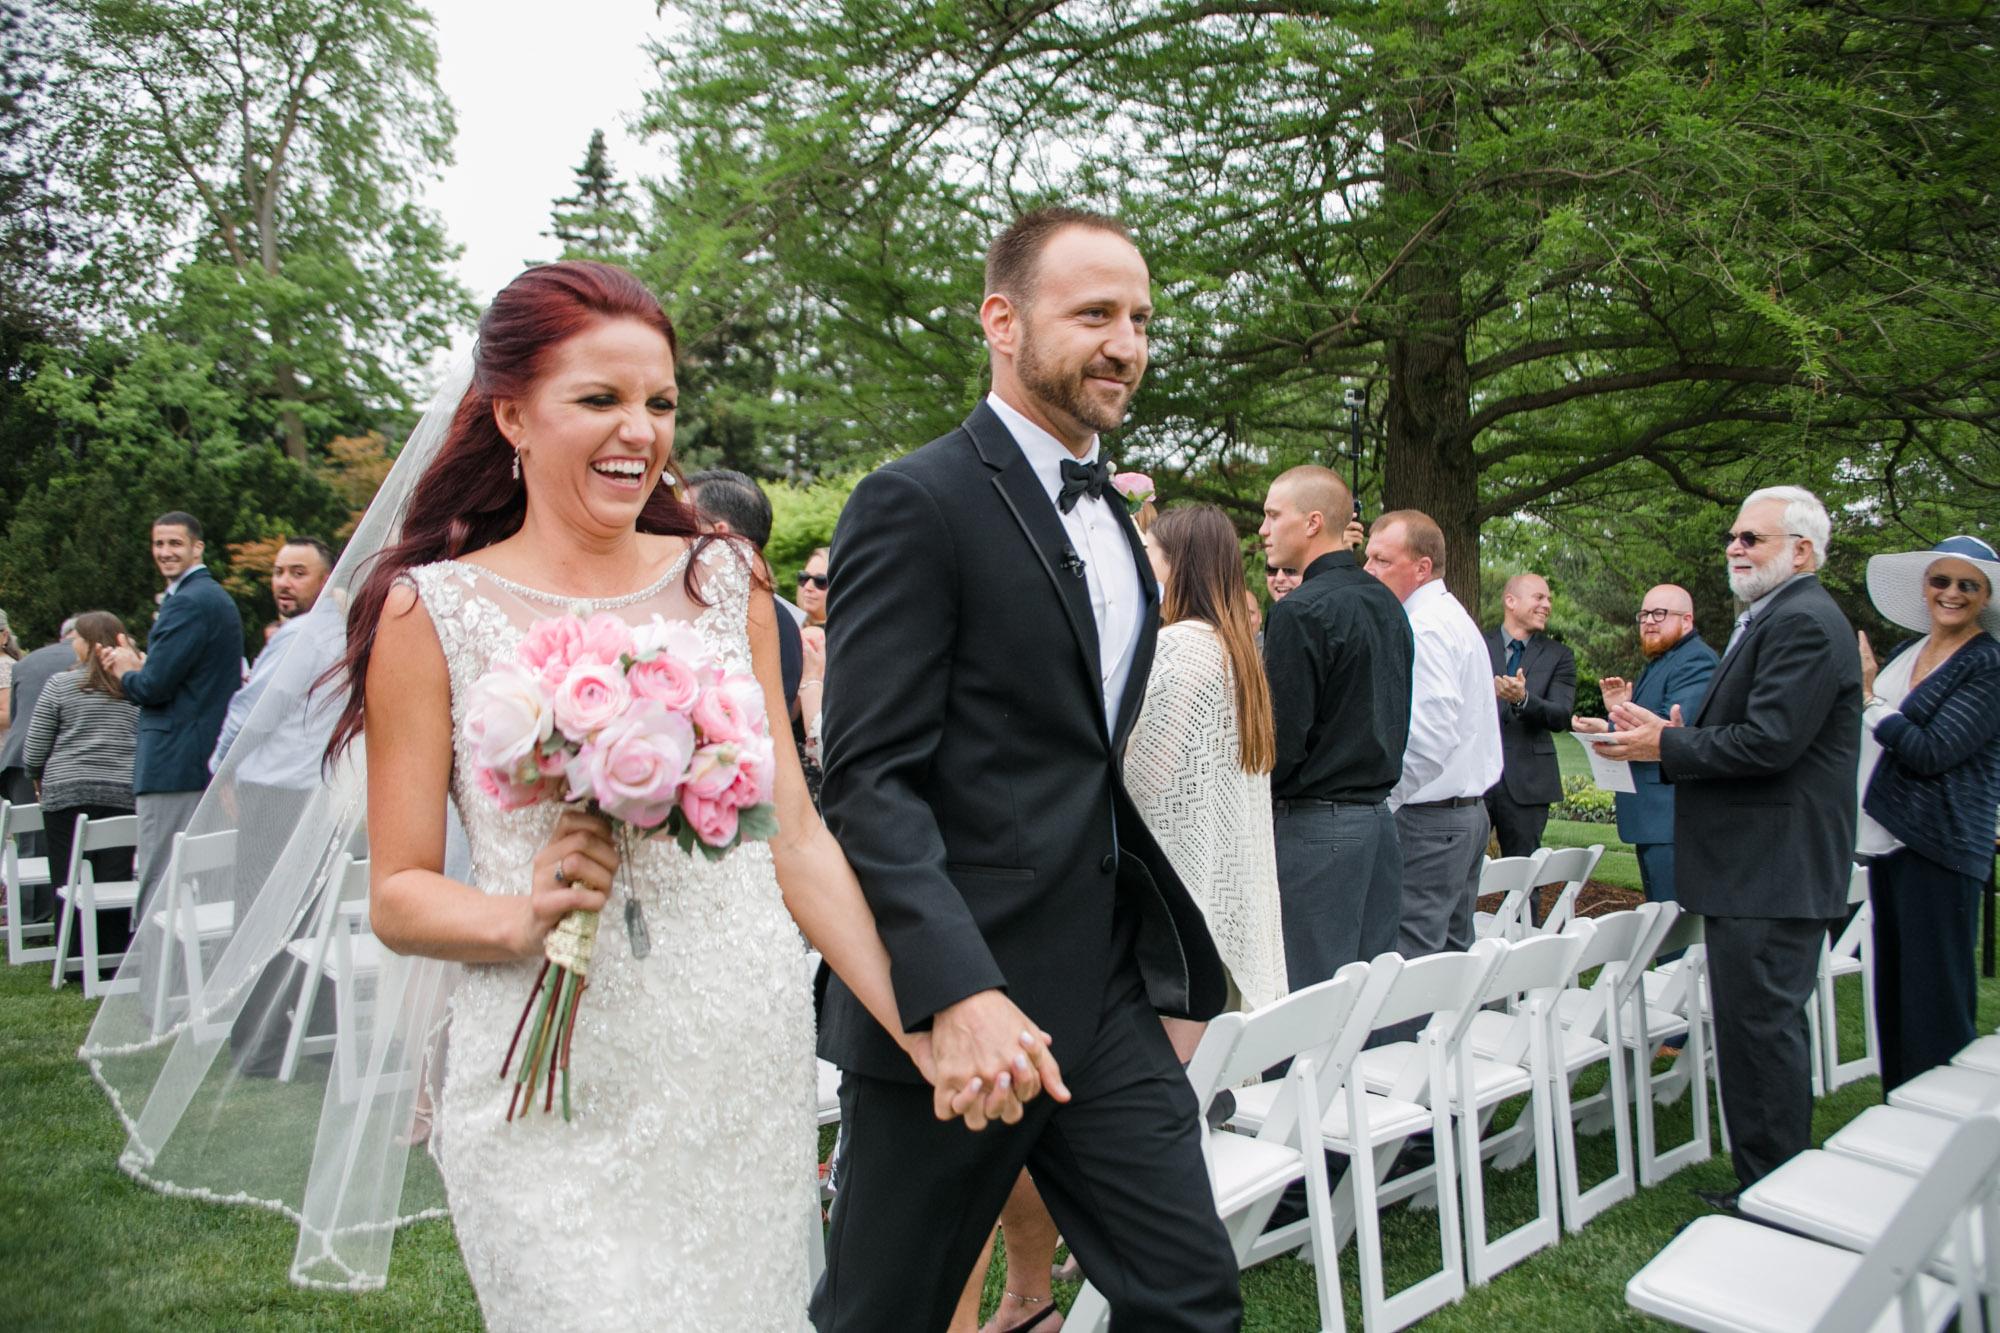 hensville-armory-wedding (4 of 8).jpg